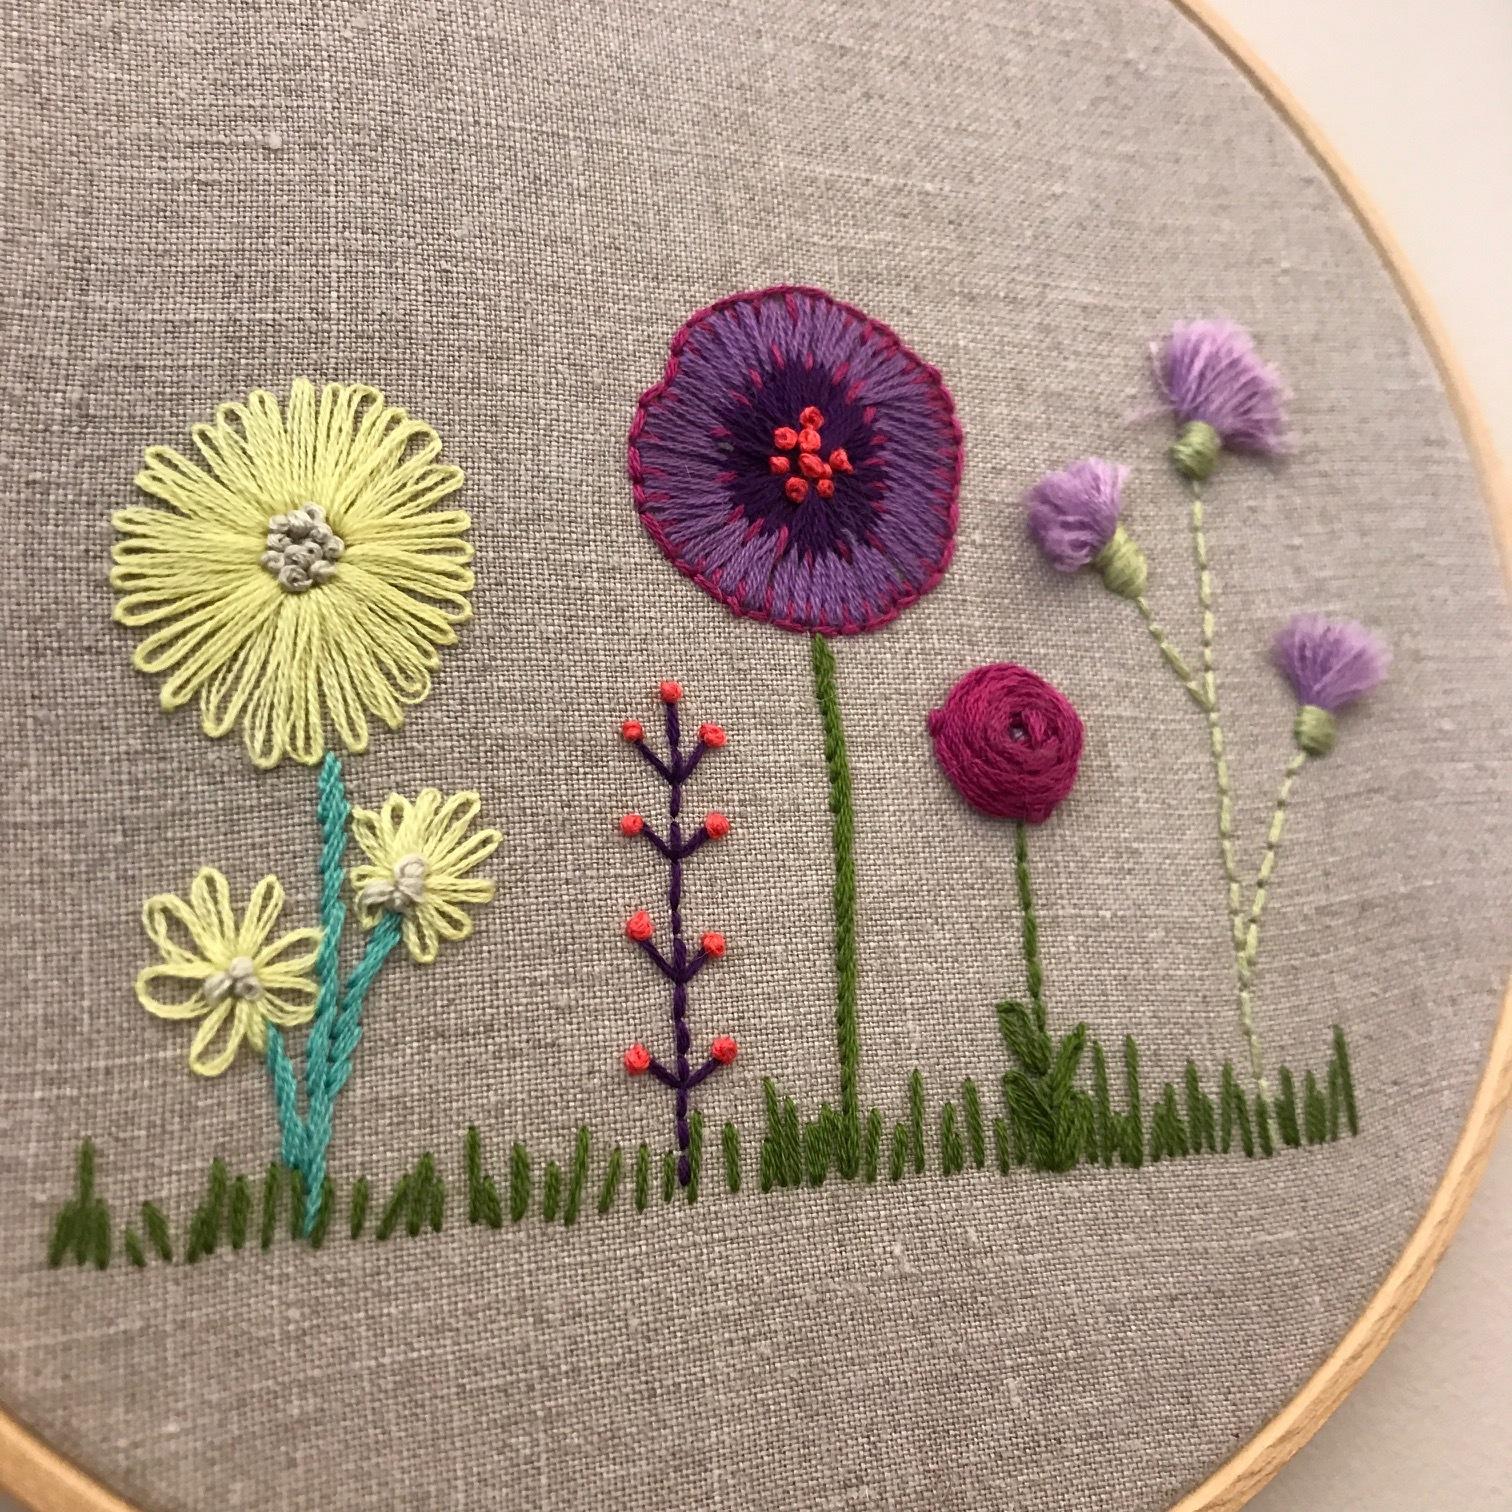 FLower Embroidery2.JPG